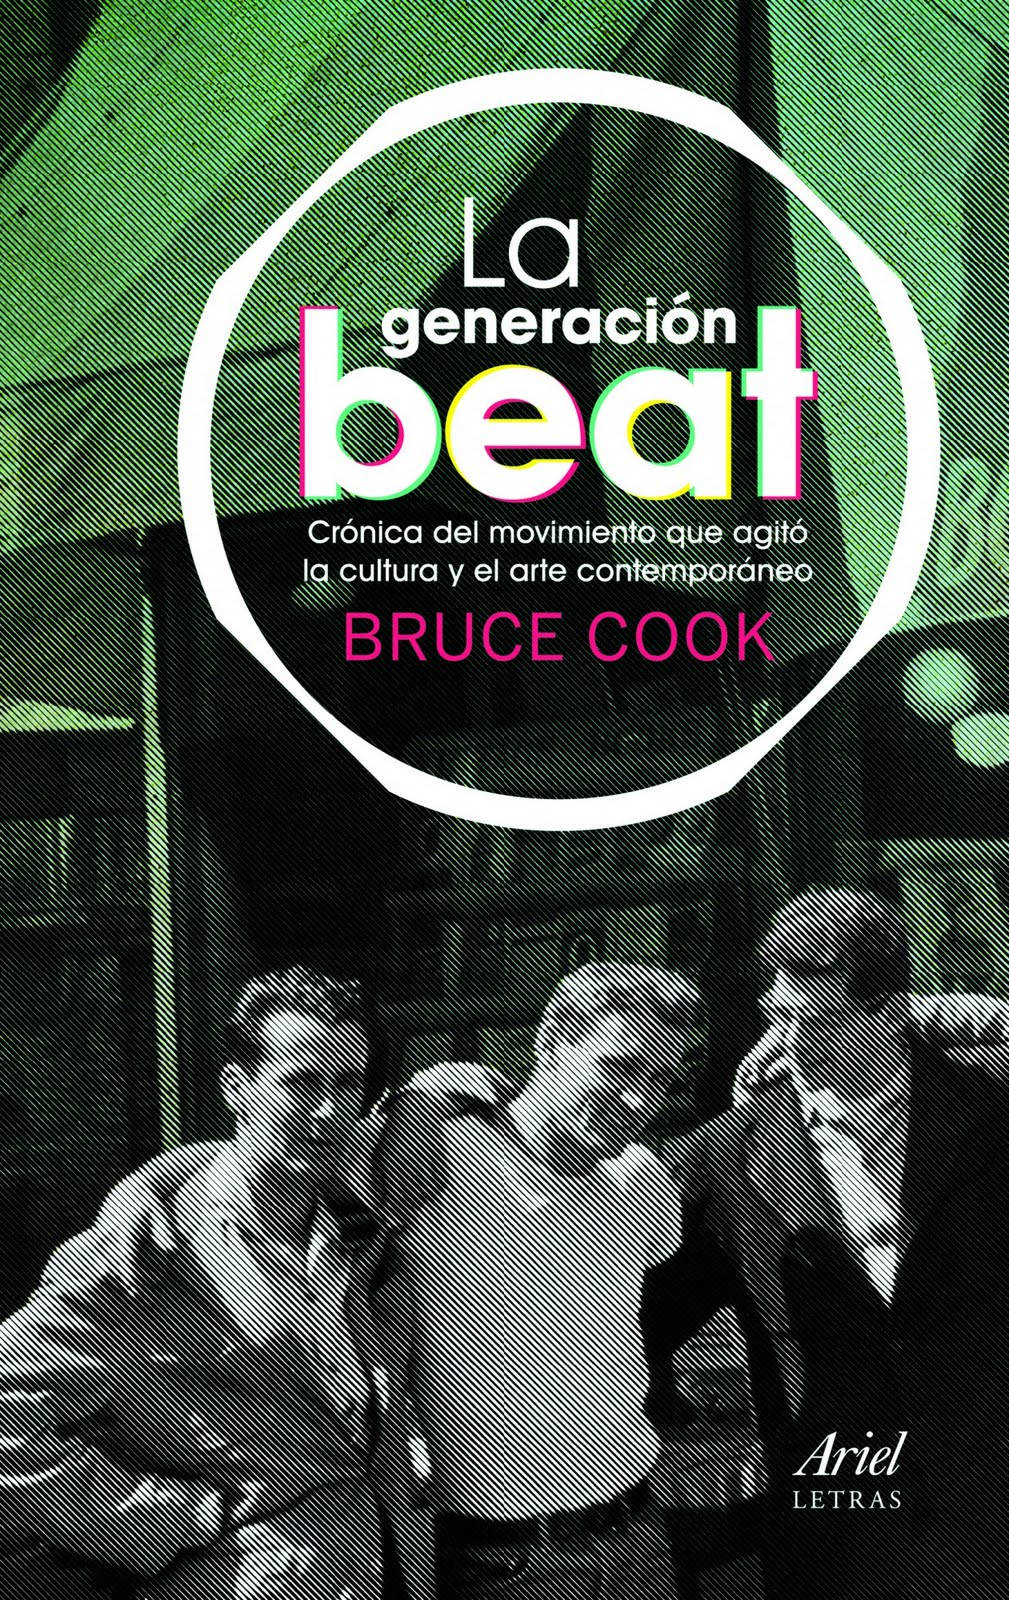 generacion beat: